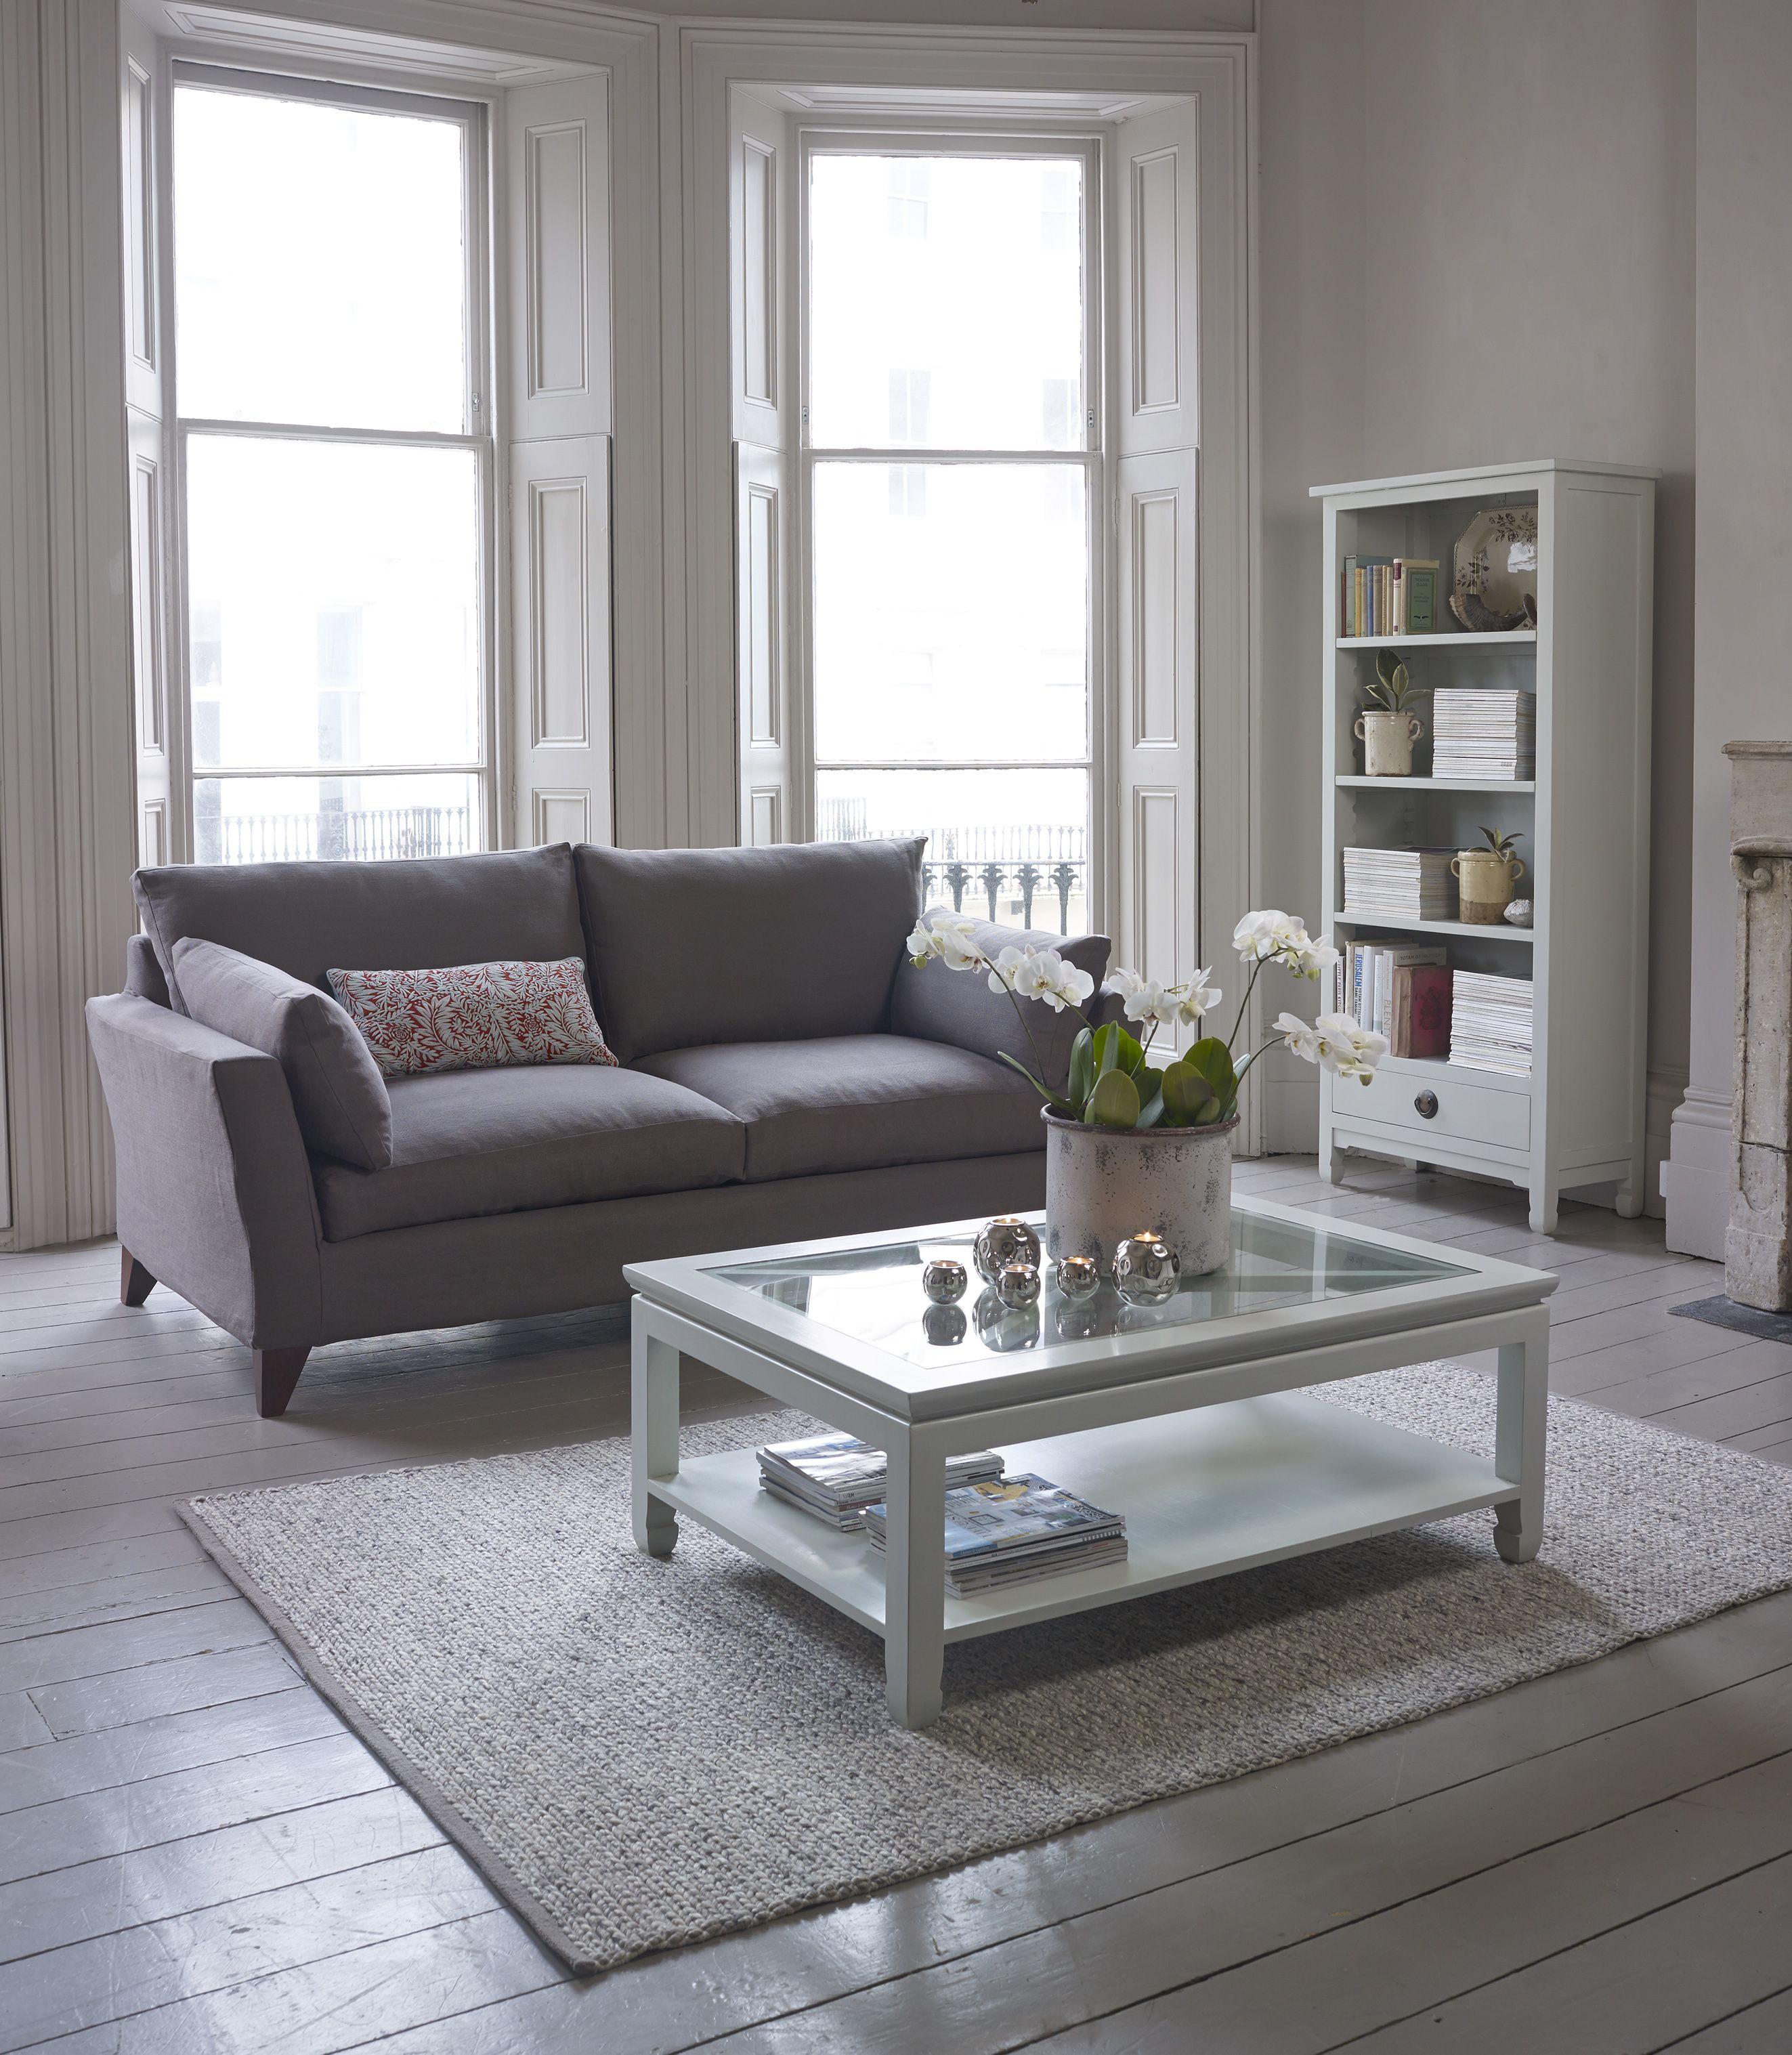 elegant furniture and lighting. Handcrafted Furniture, Lighting \u0026 Accessories Elegant Furniture And